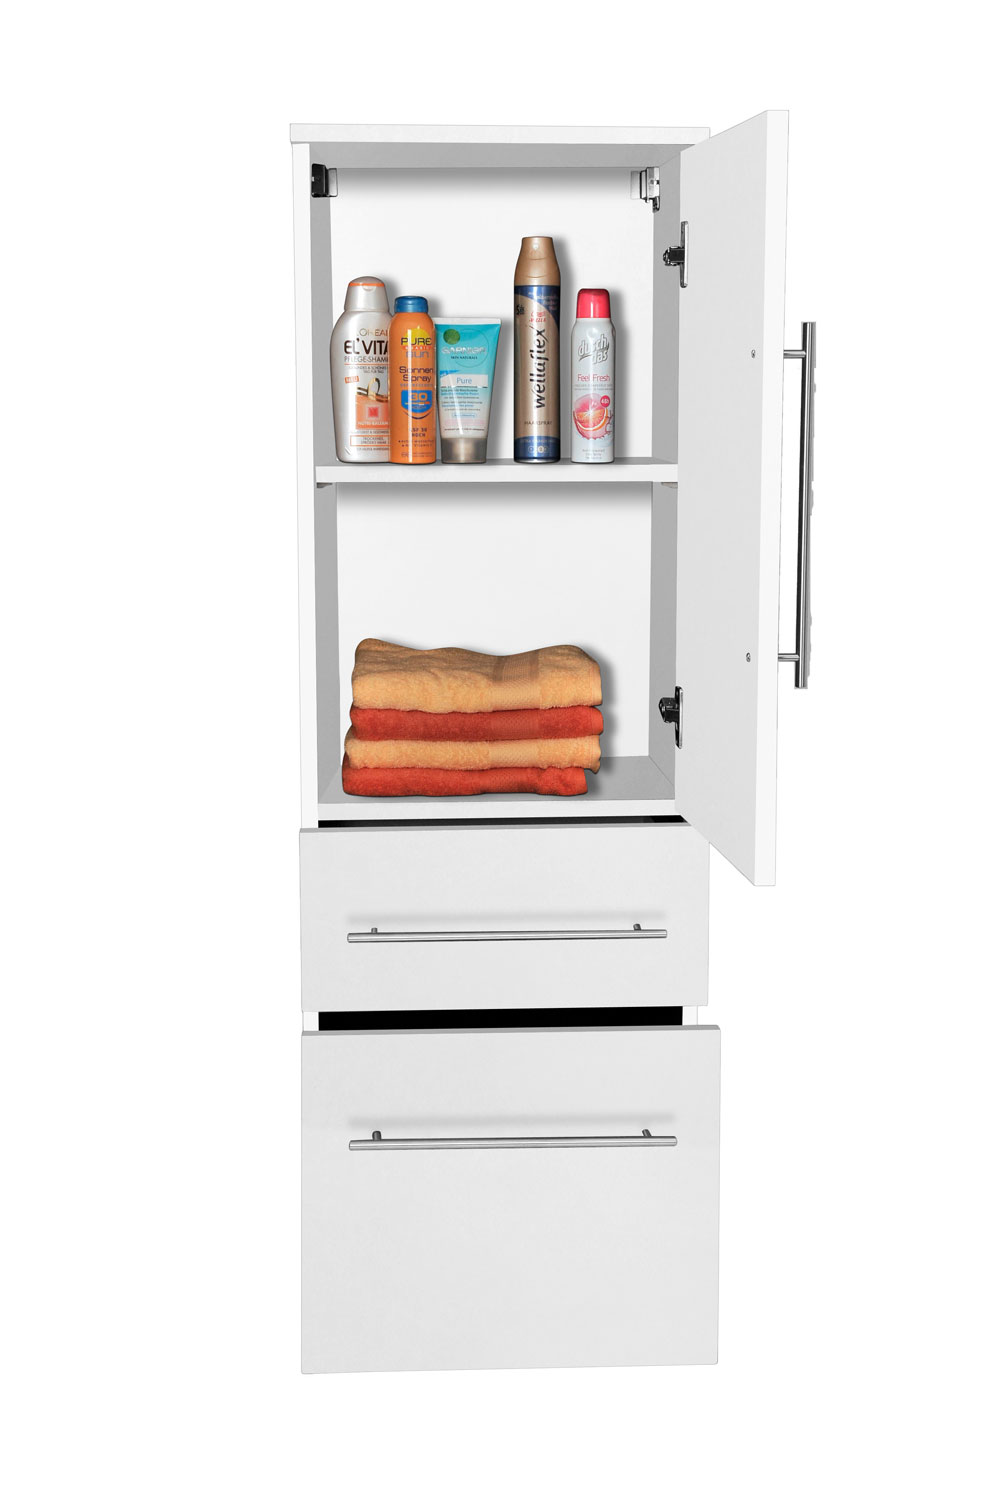 sam 5tlg badezimmer set spiegelschrank wei 90 cm verena auf lager. Black Bedroom Furniture Sets. Home Design Ideas